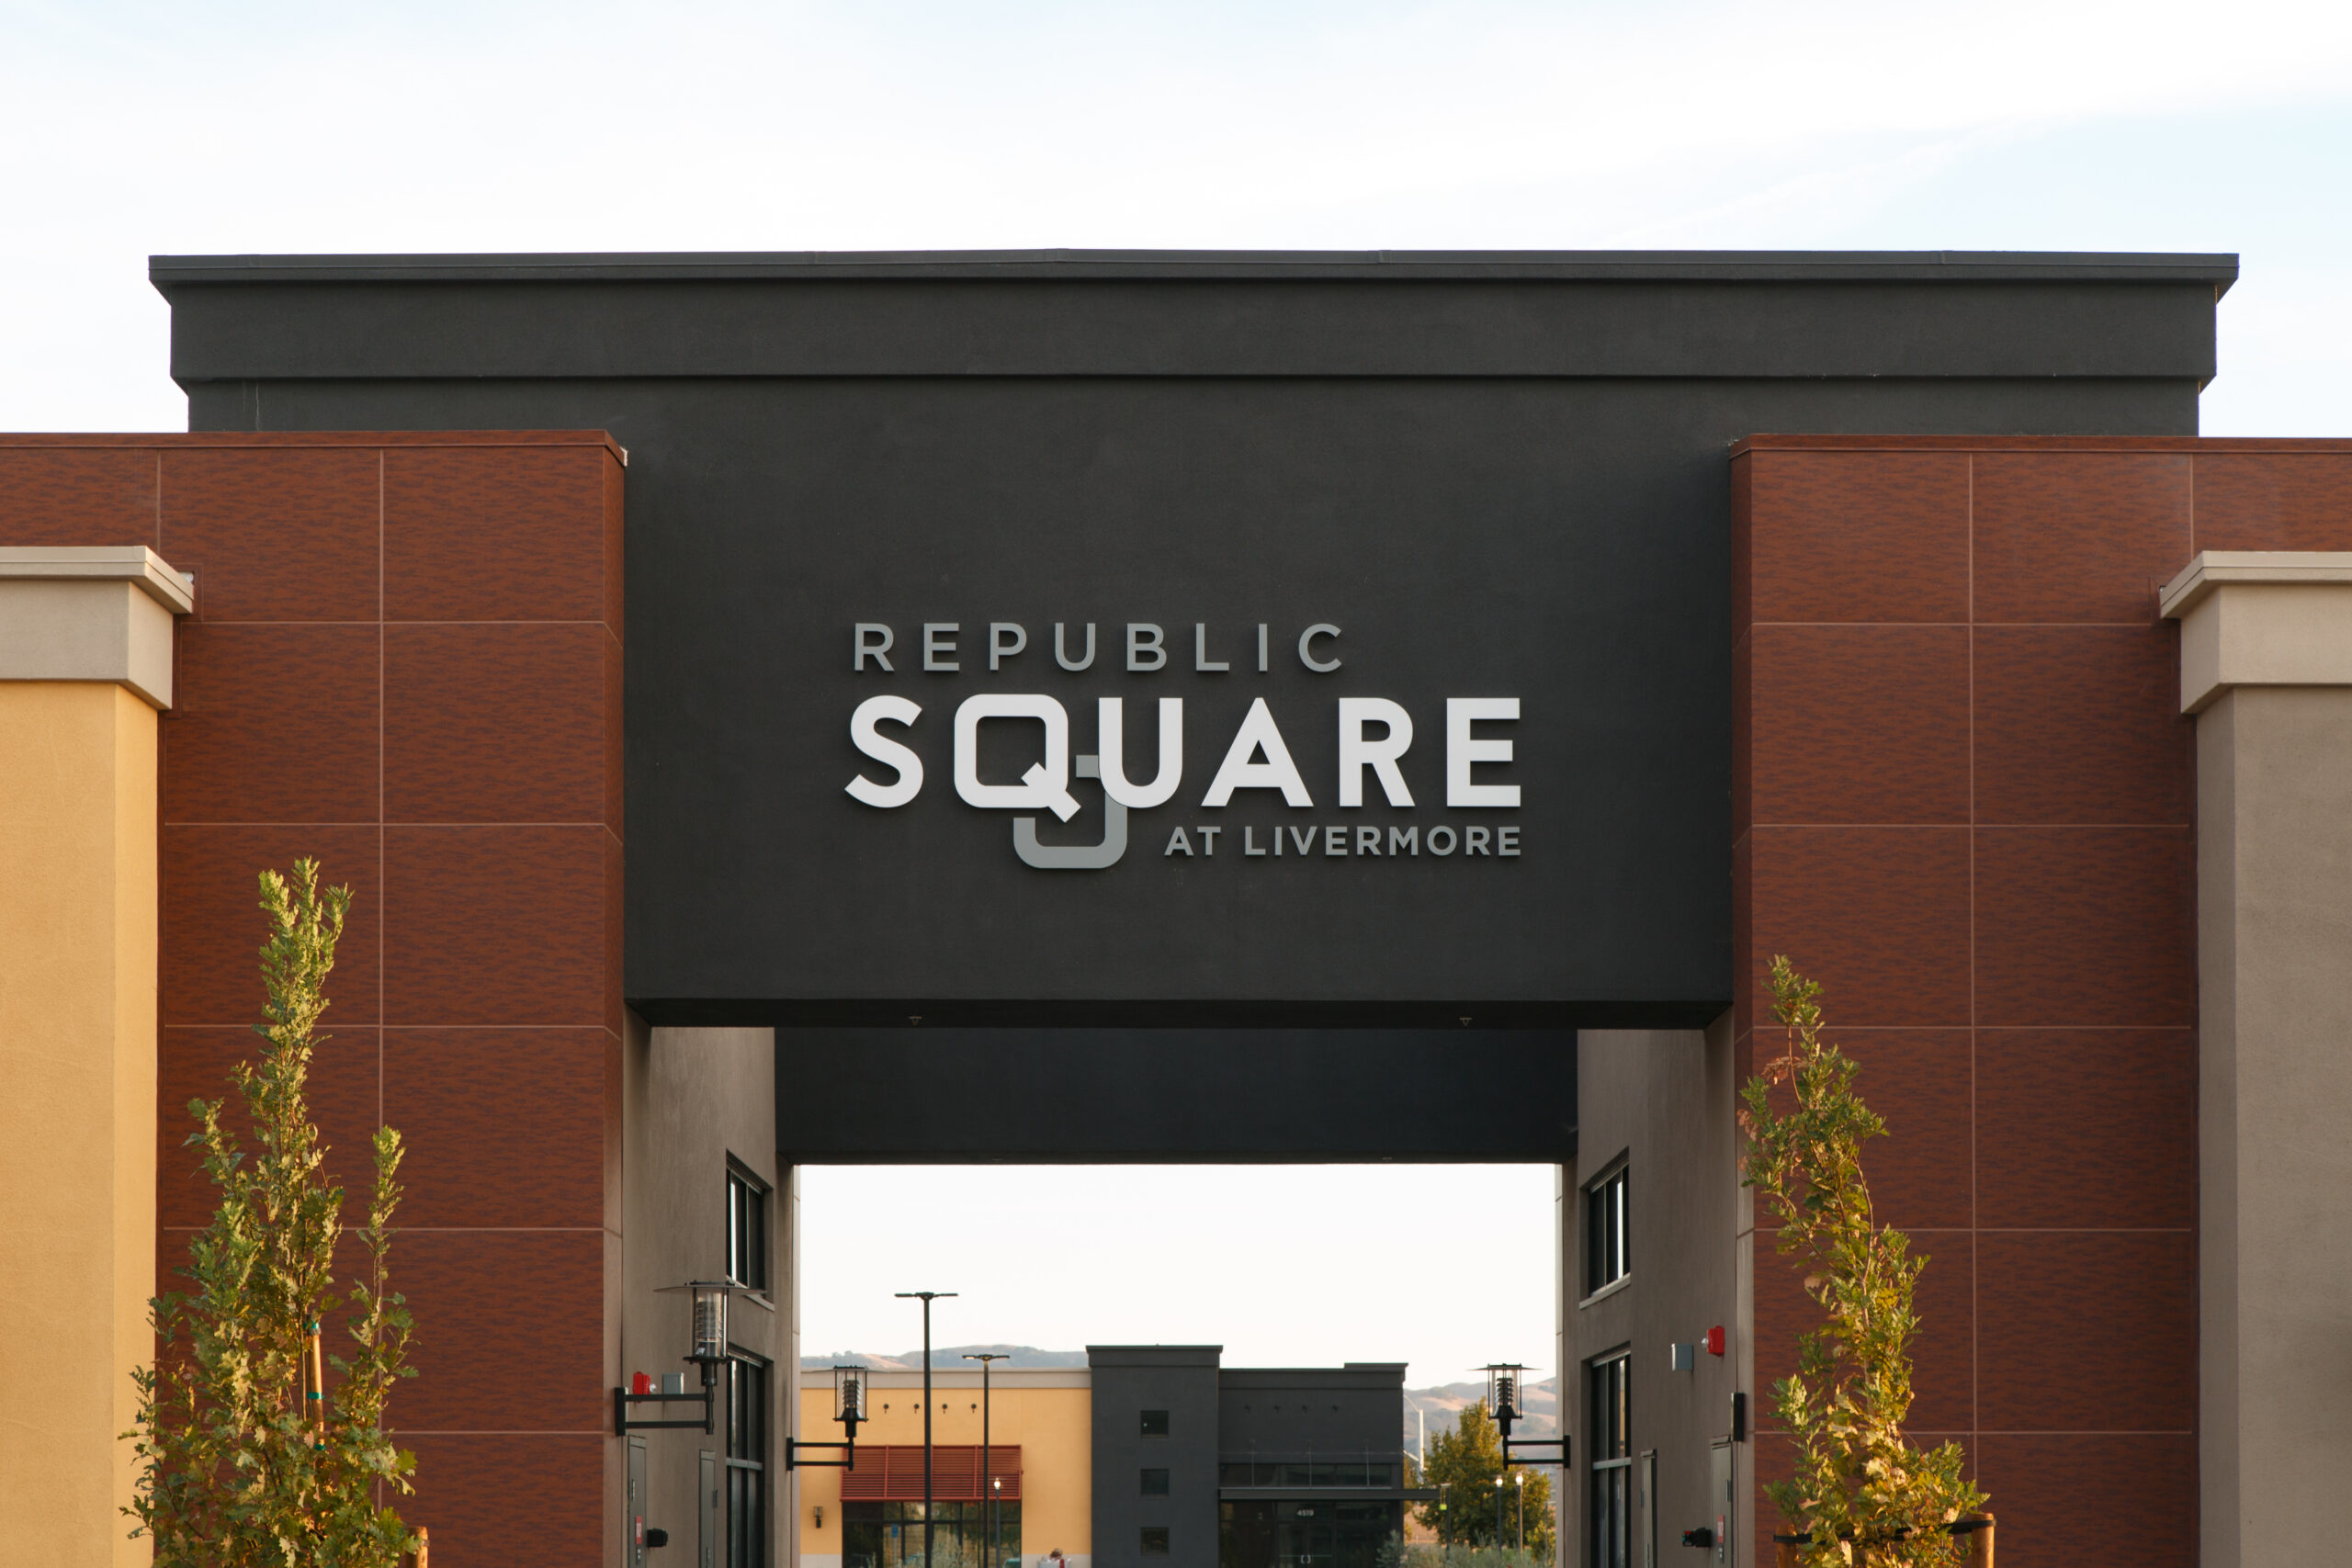 Republic Square at Livermore Hosts Art Walk